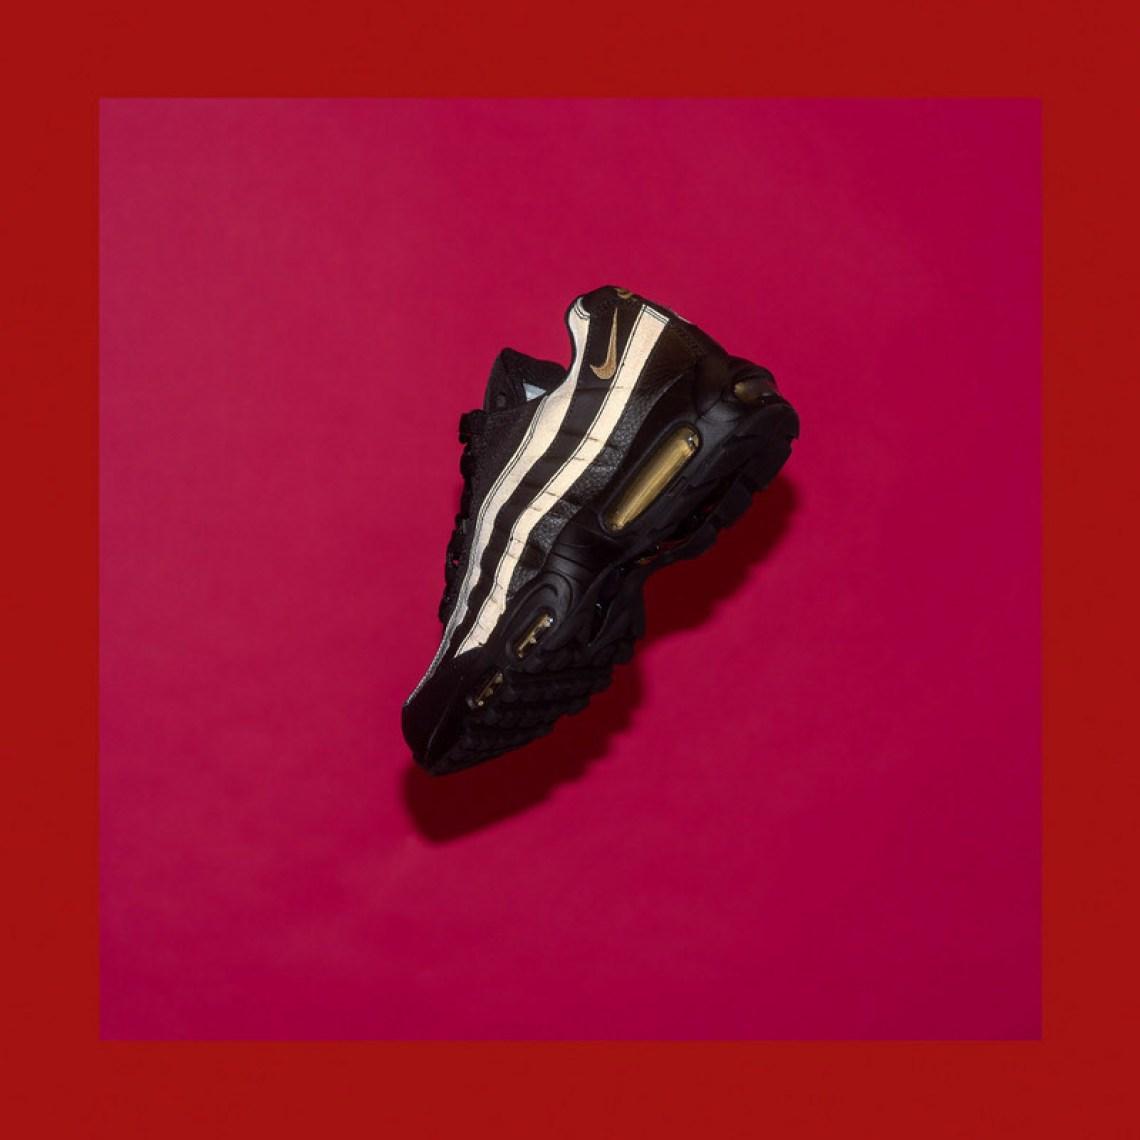 Nike Air Max 95 Premium SE Black Metallic Gold    Available Now ... 079865819